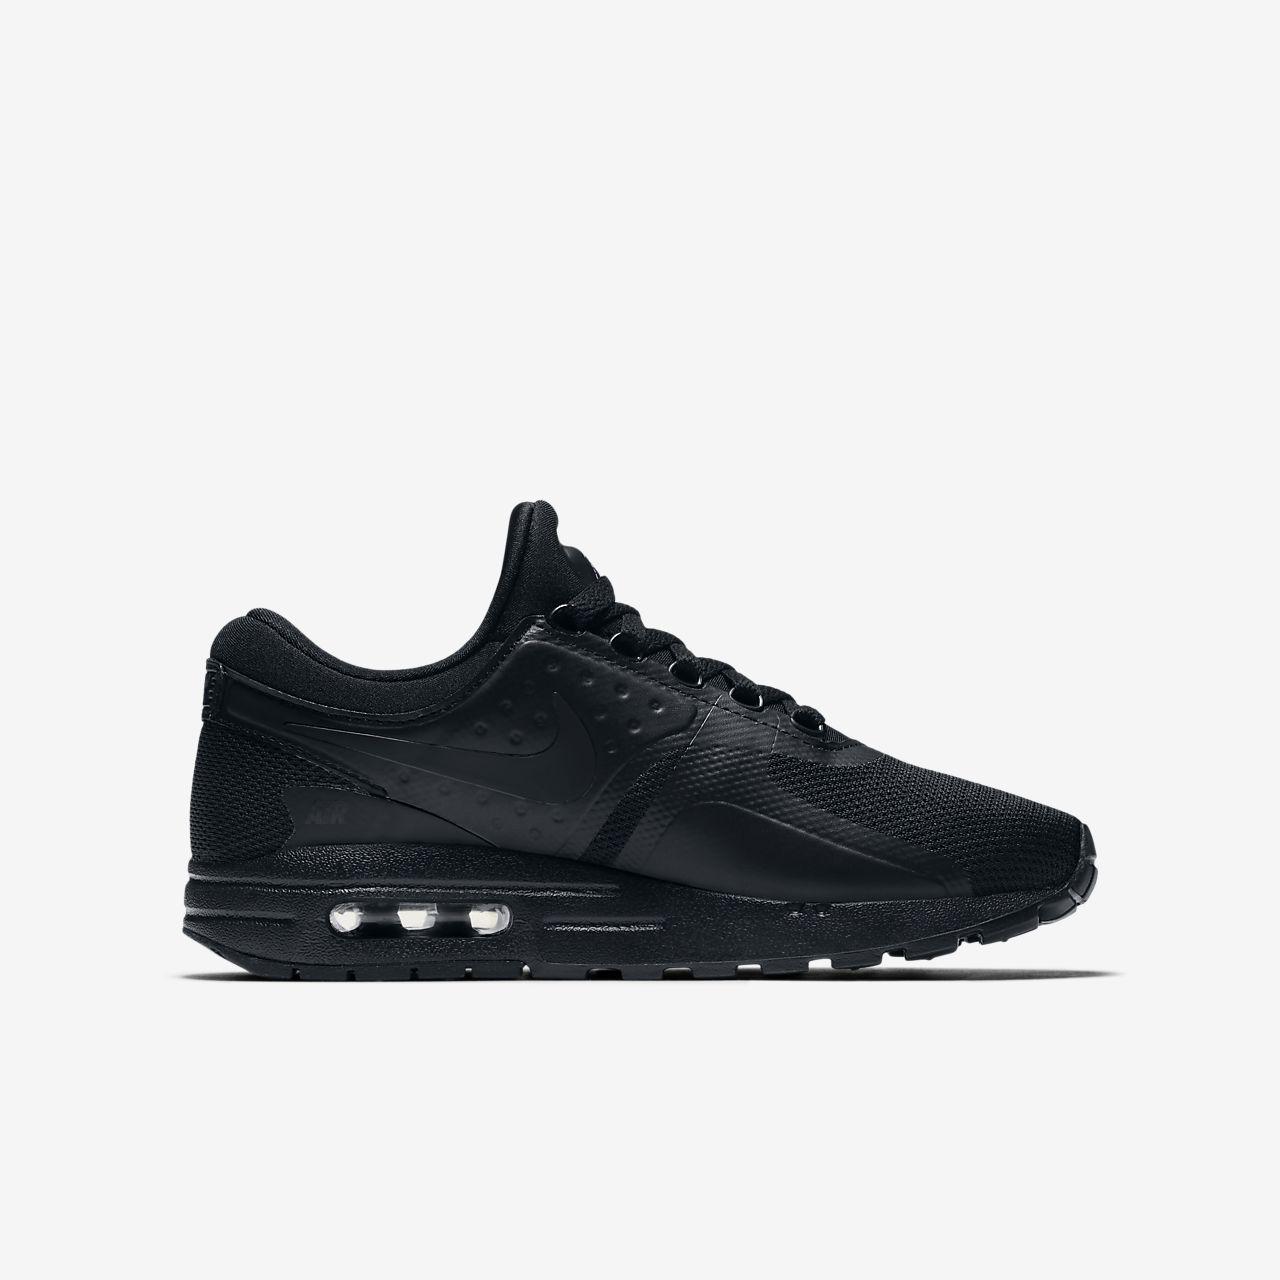 the latest 8bc11 d6d82 ... Nike Air Max Zero Essential Schuh für ältere Kinder .